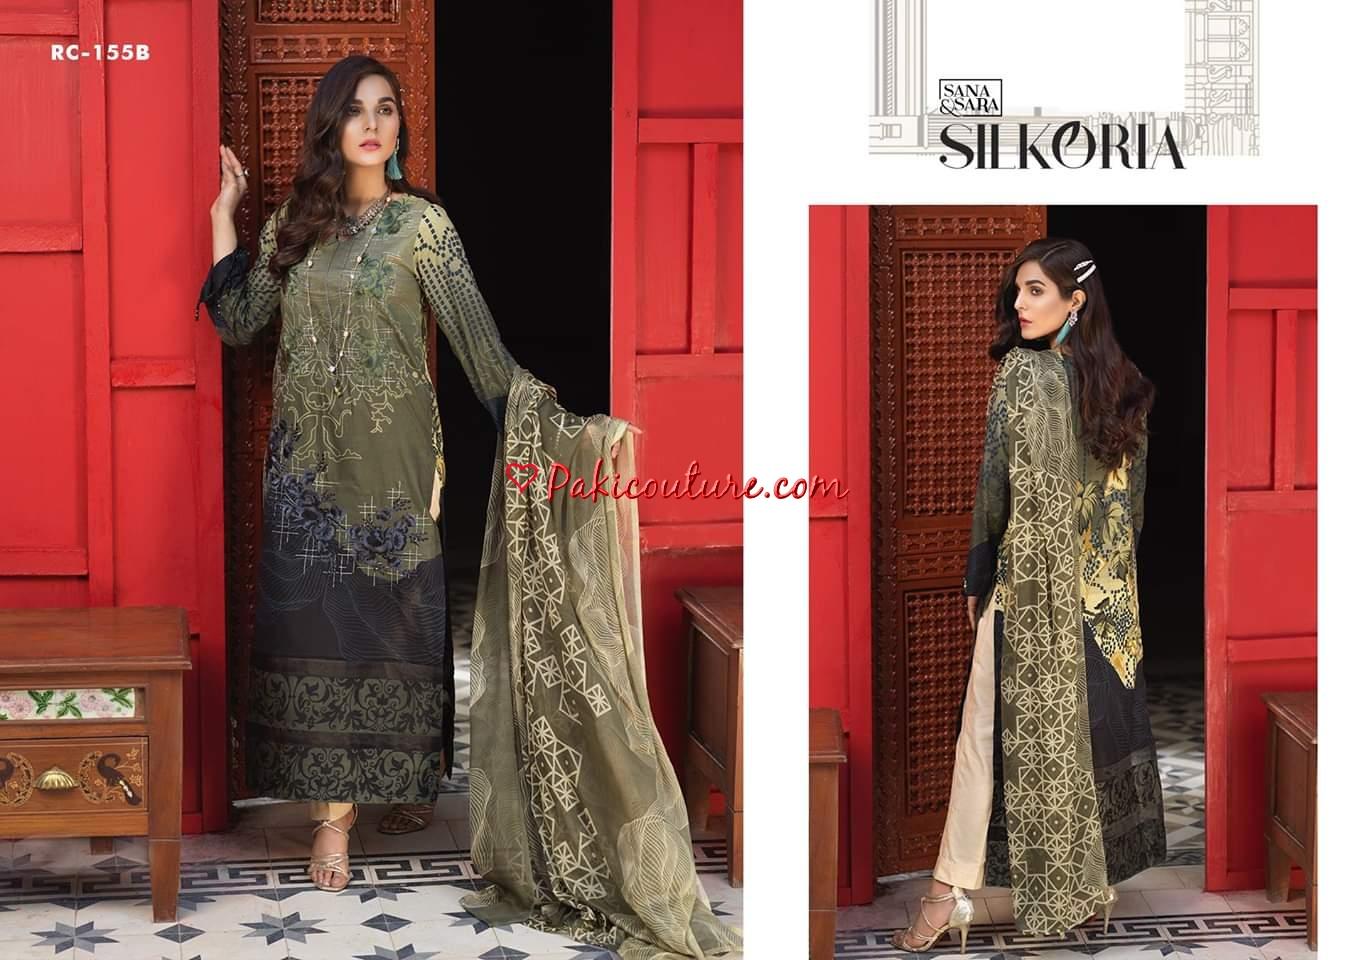 75ff097d88 Sana & Sara Silkoria Embroidered Lawn Vol-3 2019 Shop Online | Buy ...